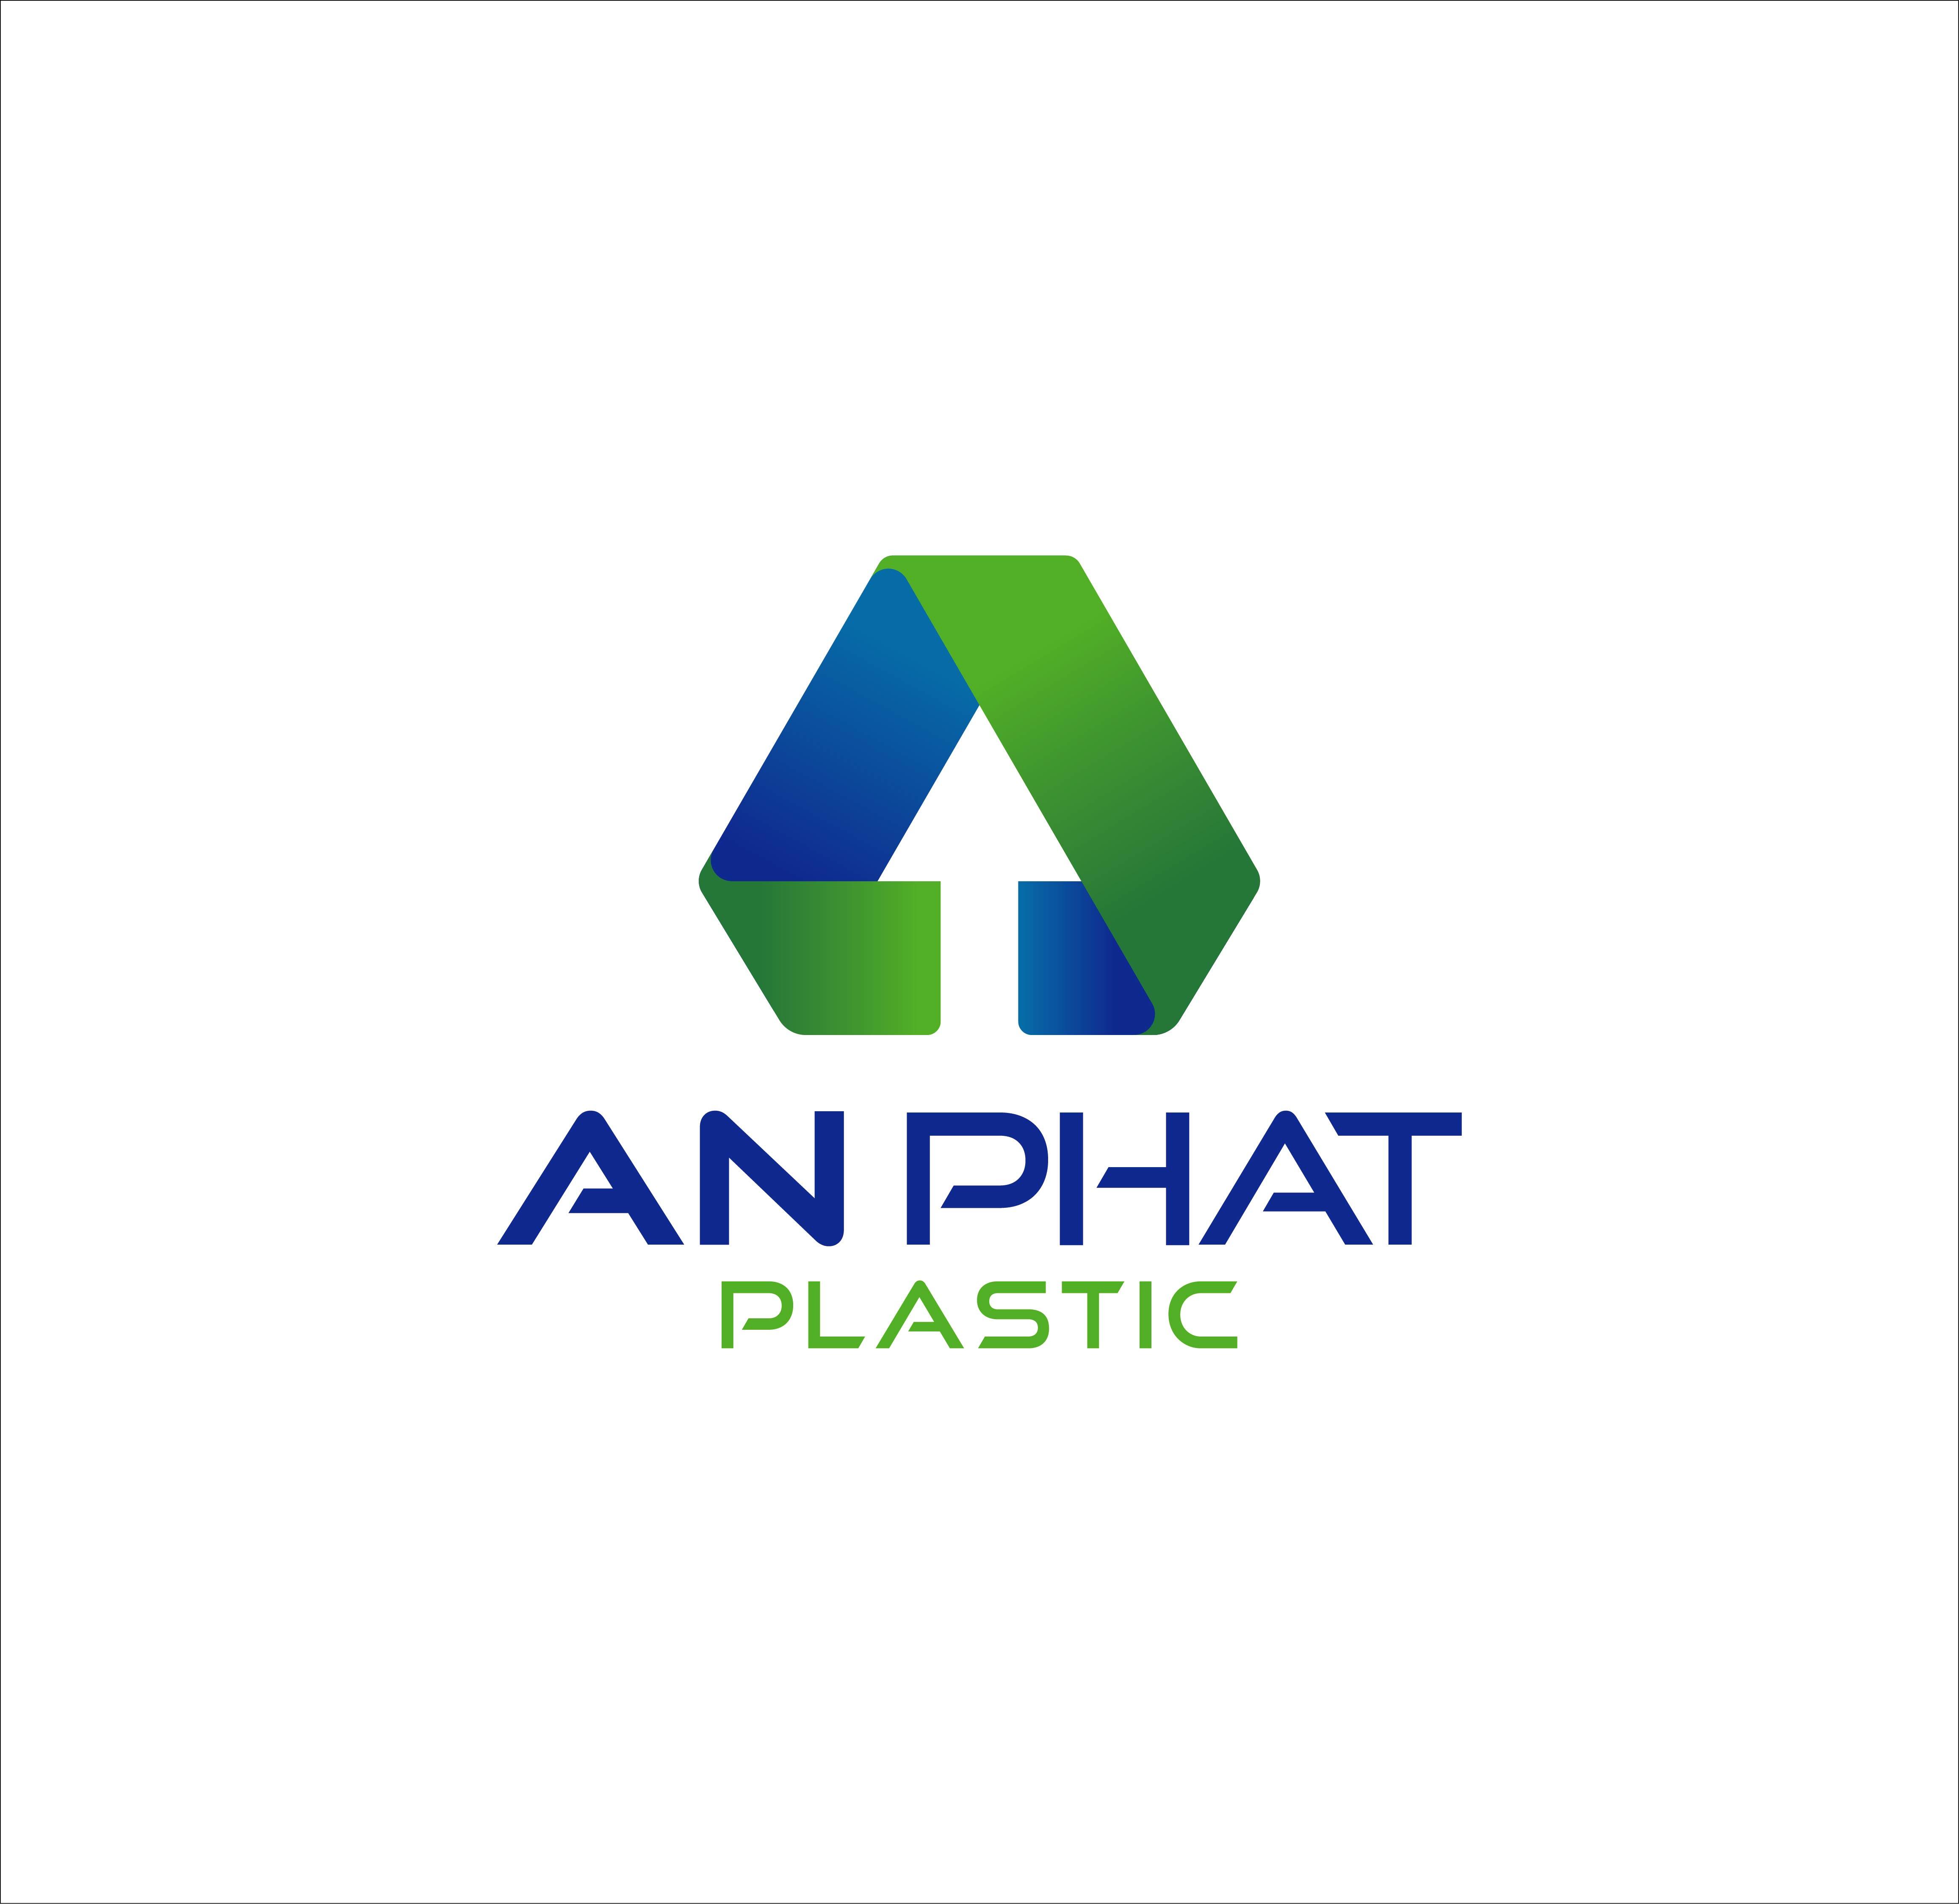 AnPhat Plastic 01